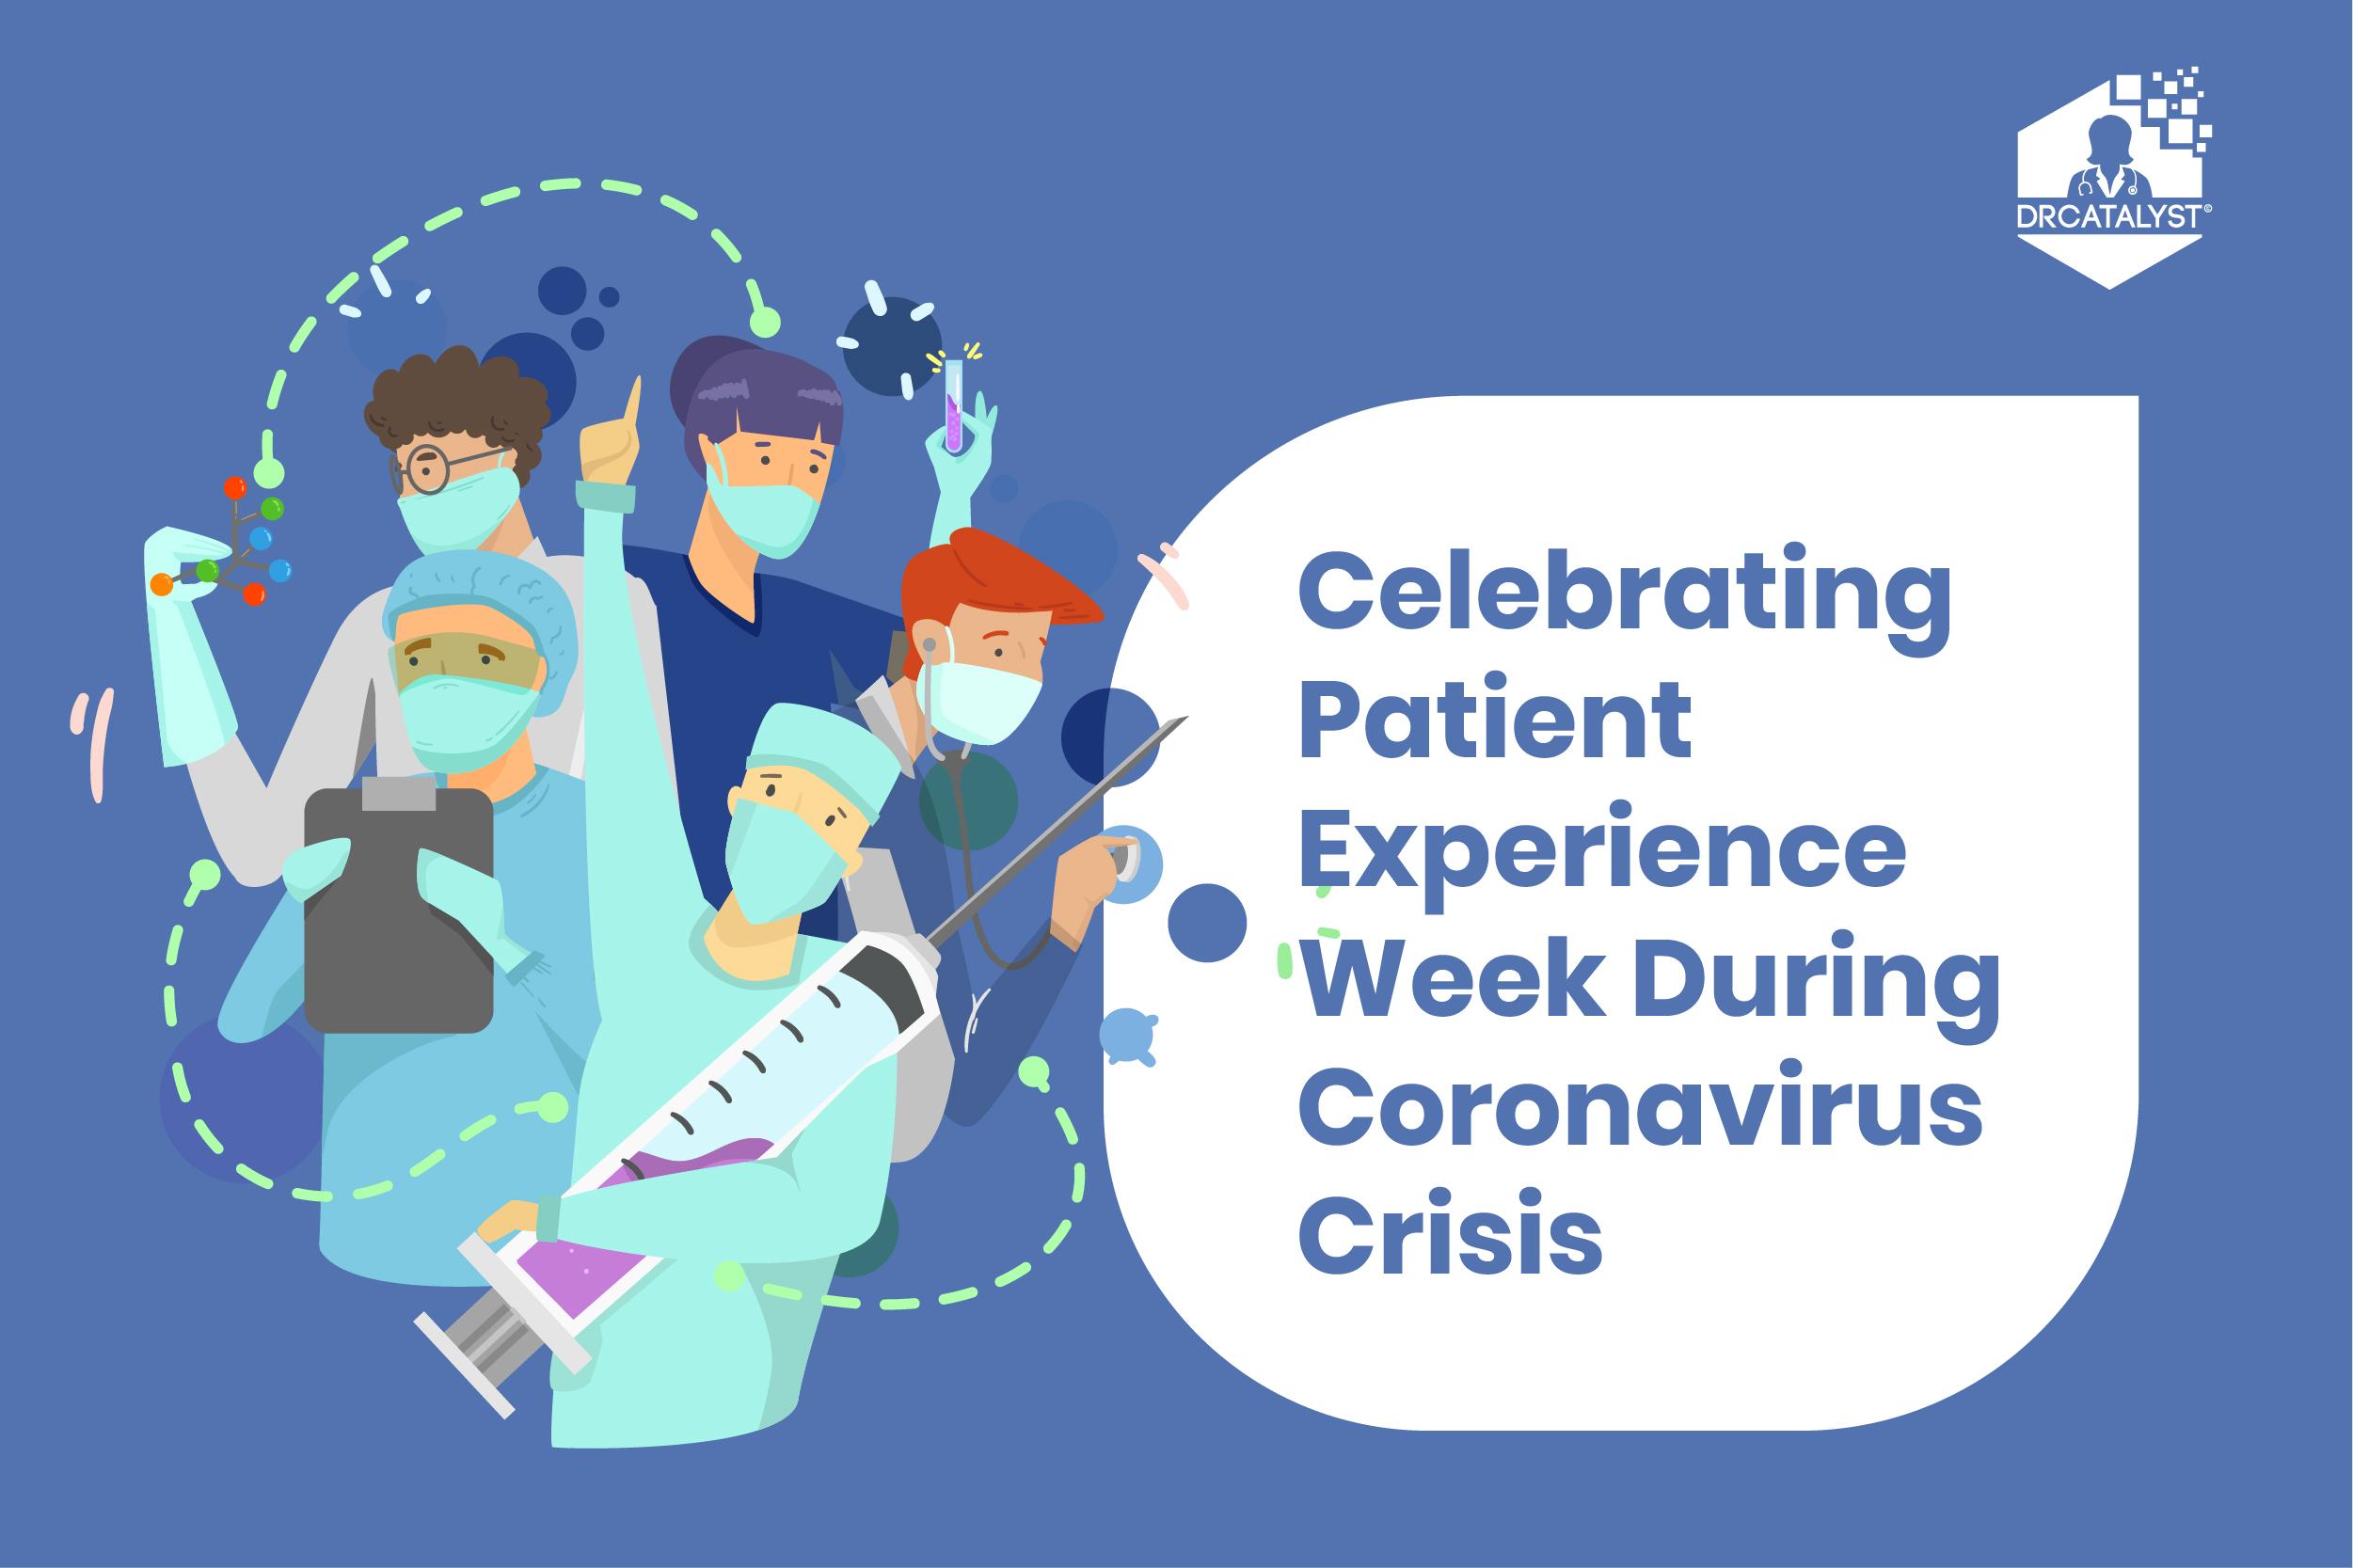 Patient Experience Week During Coronavirus Crisis